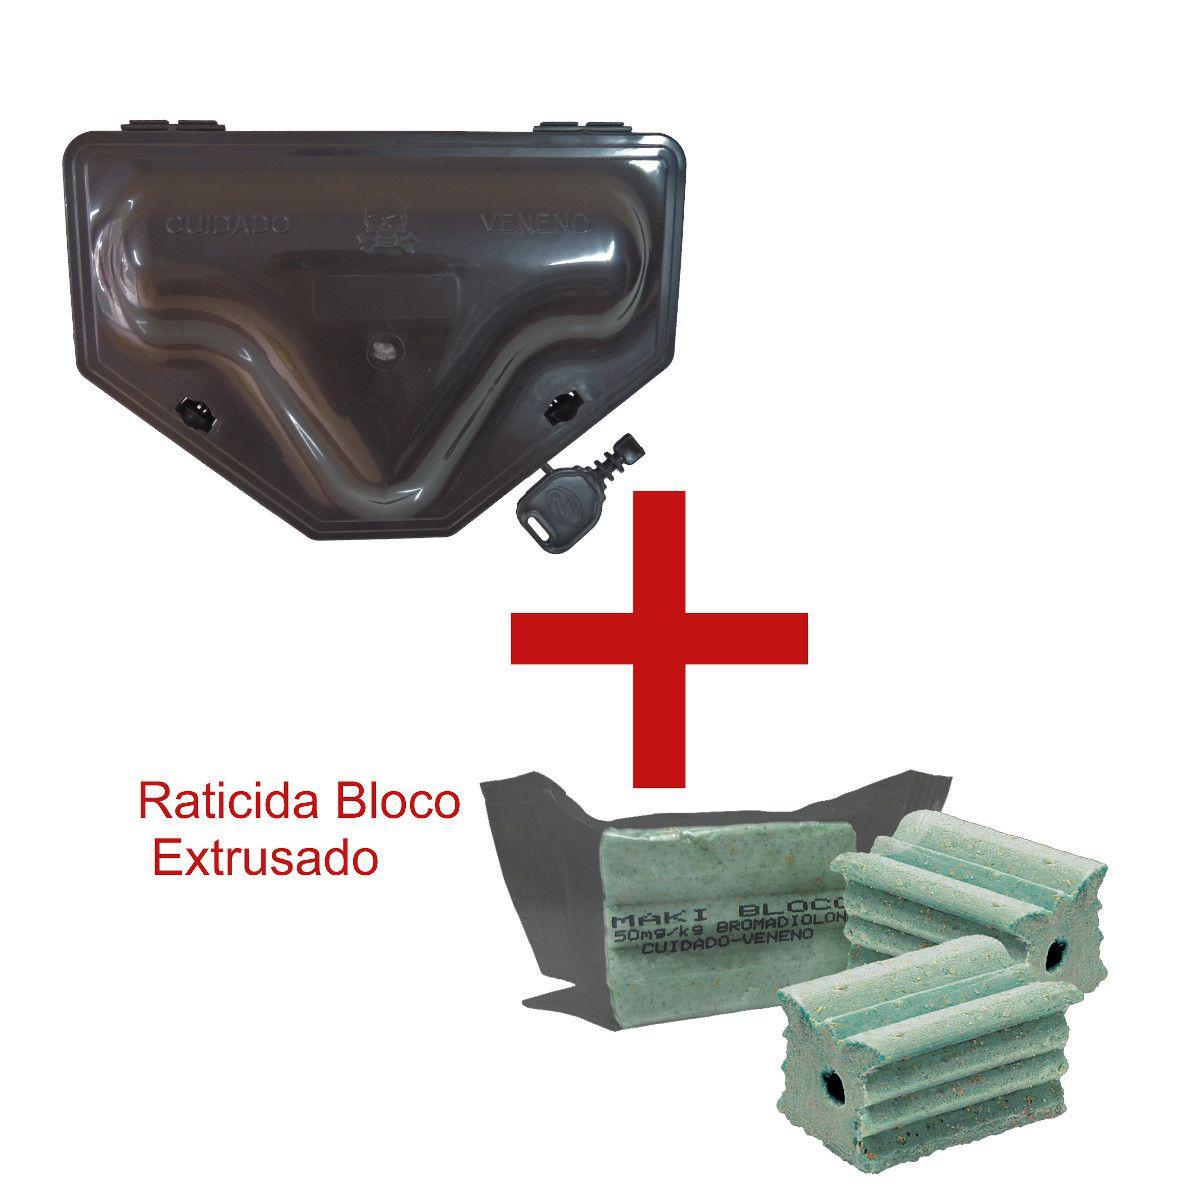 KIT 2 Porta Iscas Reforçado 2 TRAVAS Chave Ratoeira p/ ratos